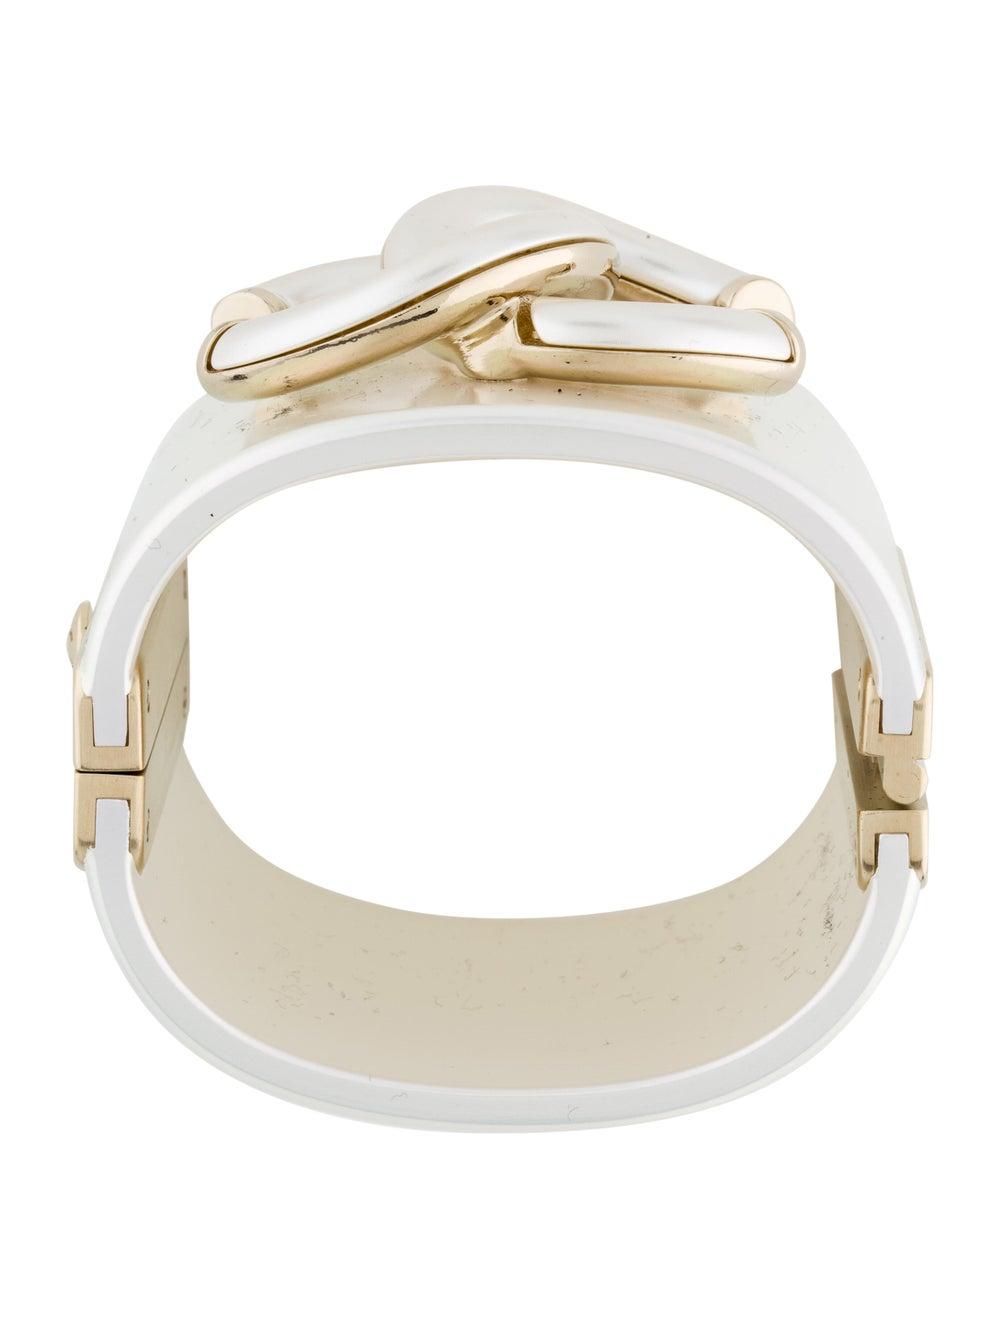 Chanel Resin CC Bracelet Gold - image 3